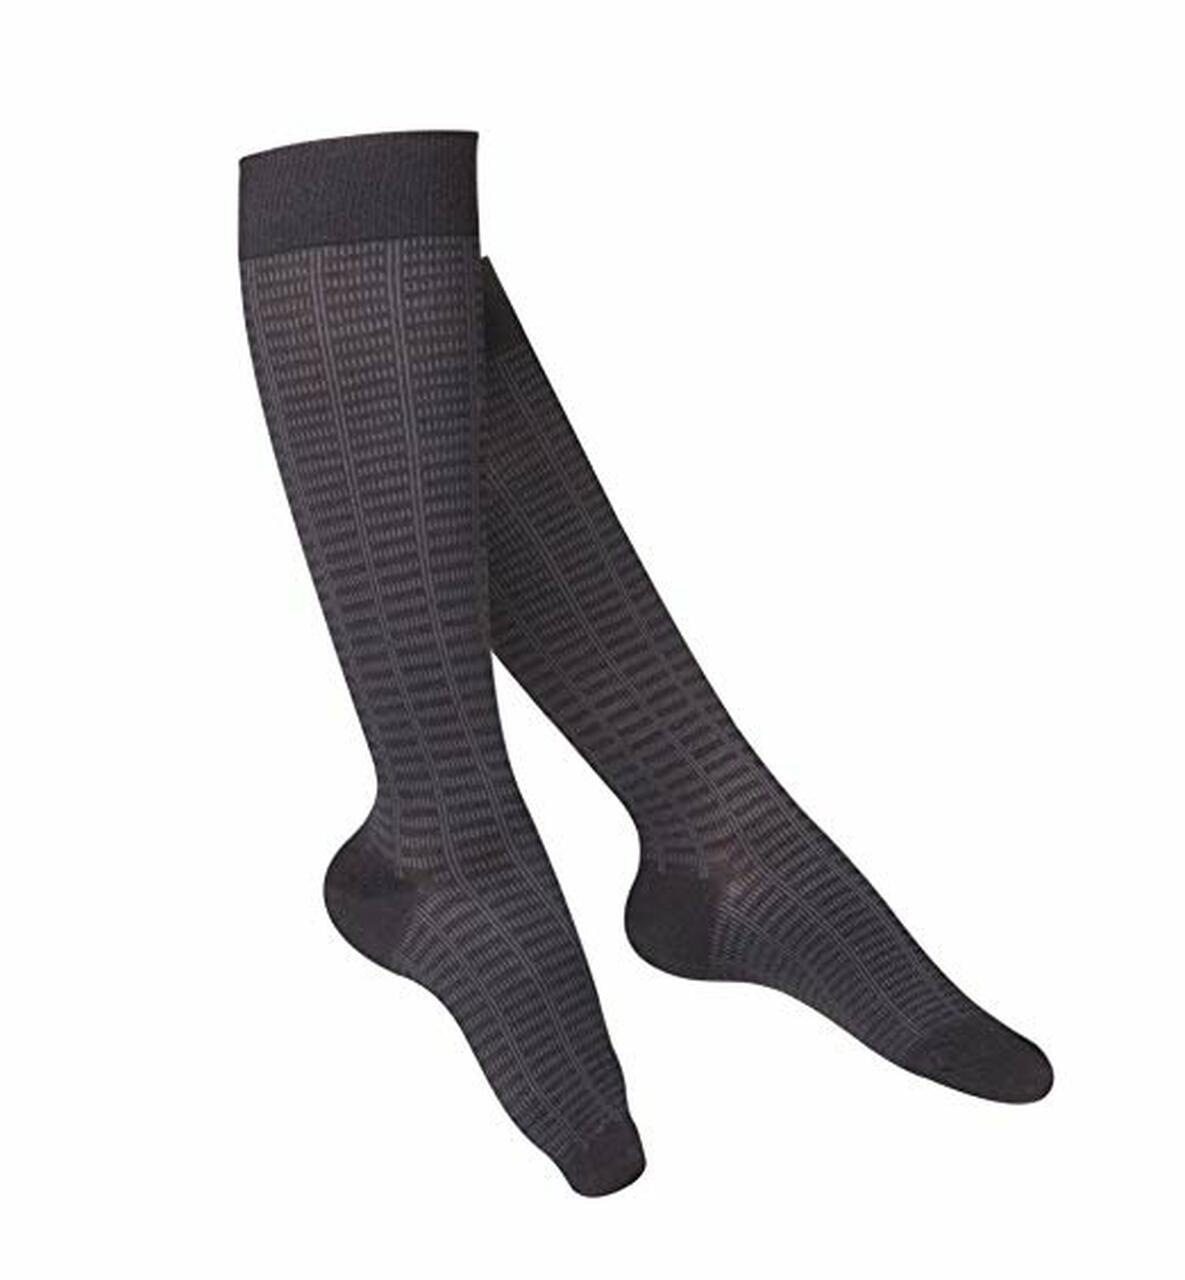 AIR 1061CH-M | Truform Ladies Touch Knee High Compression Socks